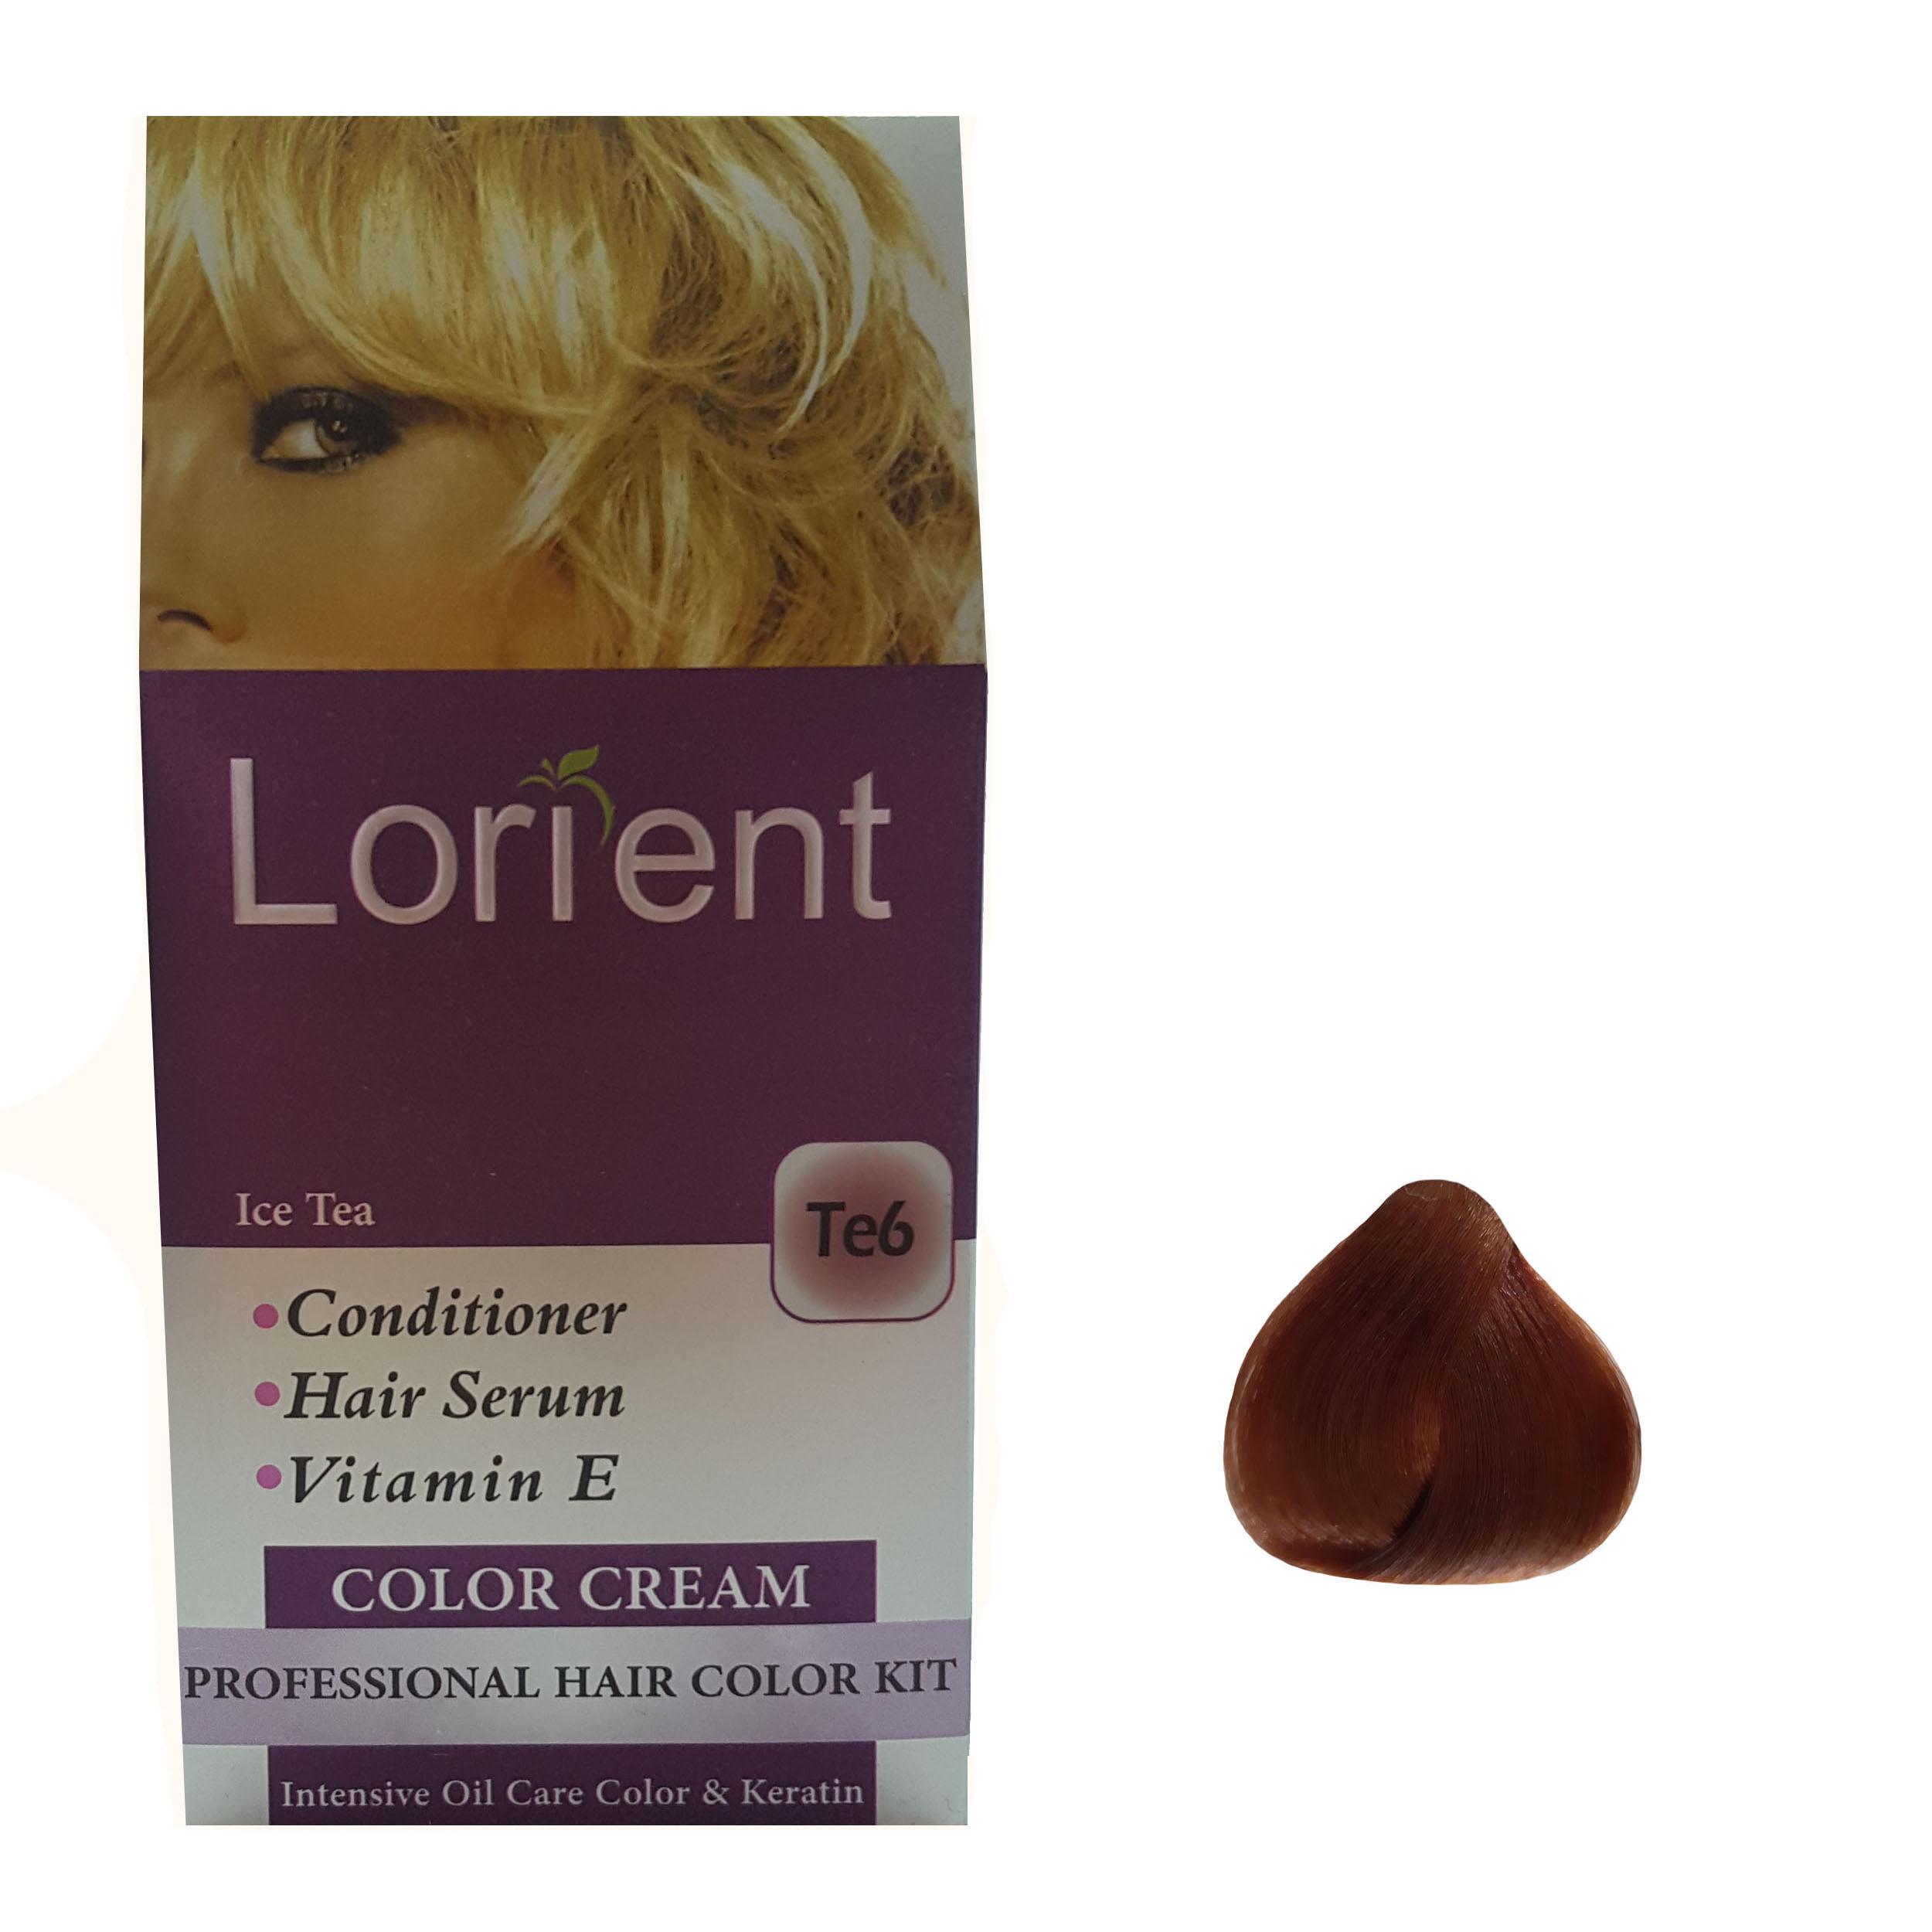 کیت رنگ مو لورینت شماره Te6 حجم 100 میلی لیتر رنگ قهوهای